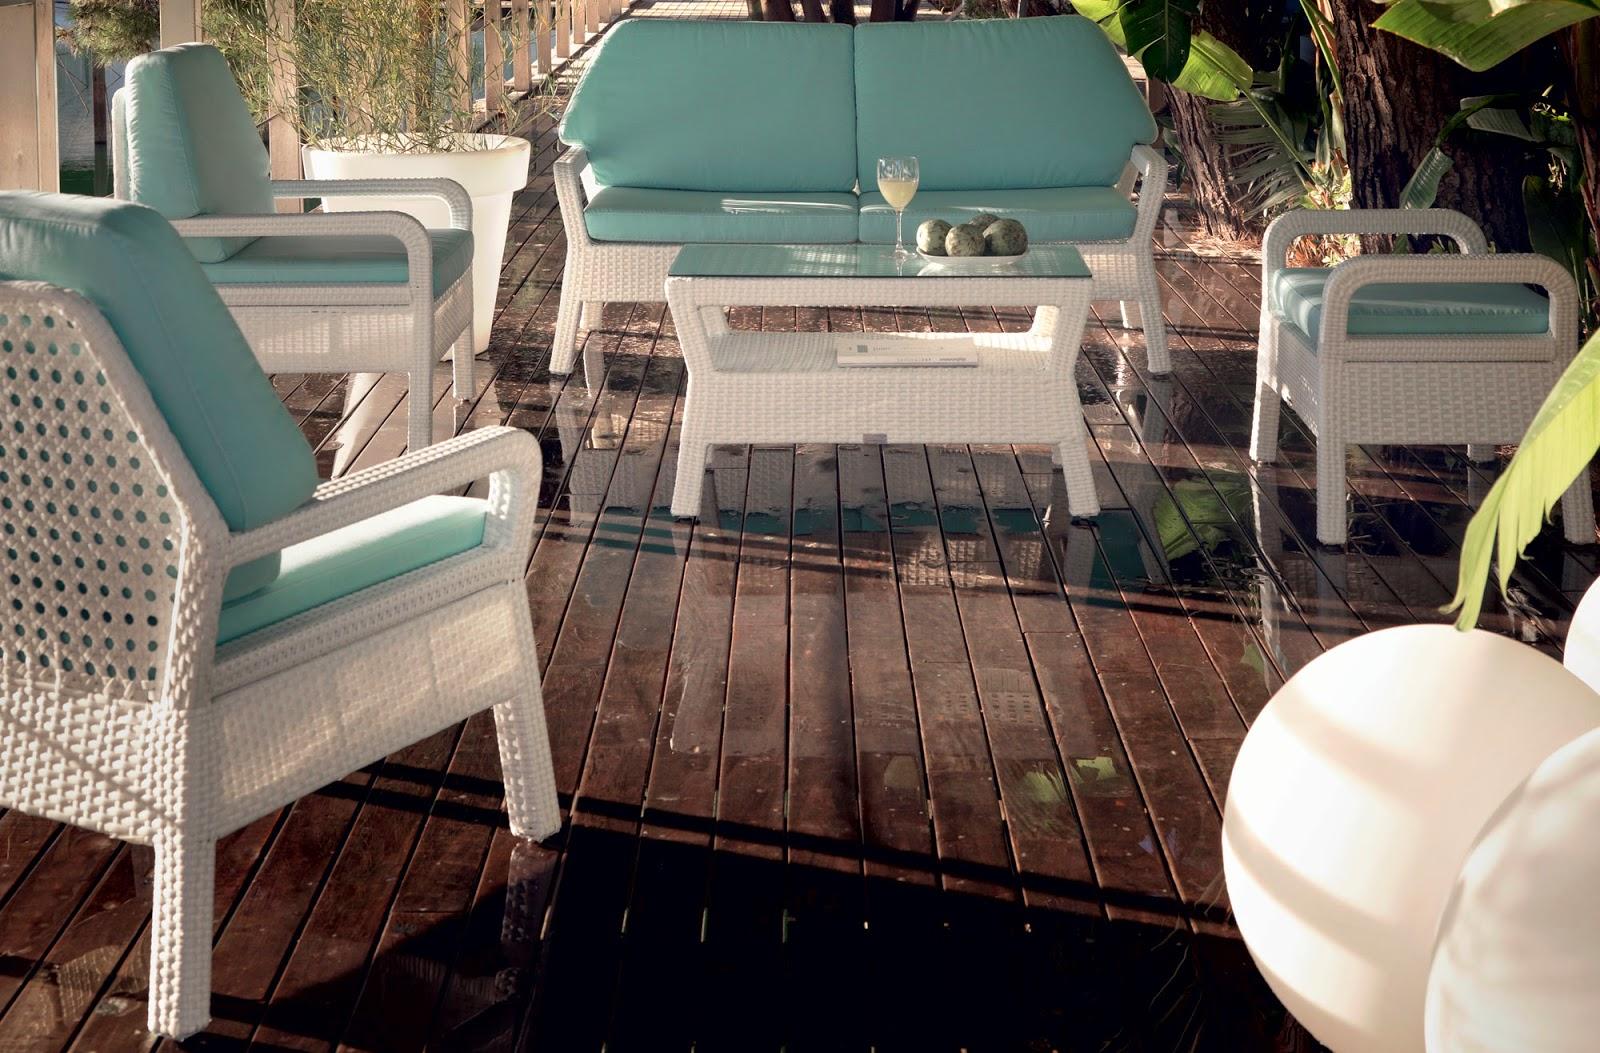 http://www.portobellostreet.es/mueble/37852/Salon-de-jardin-Tempis